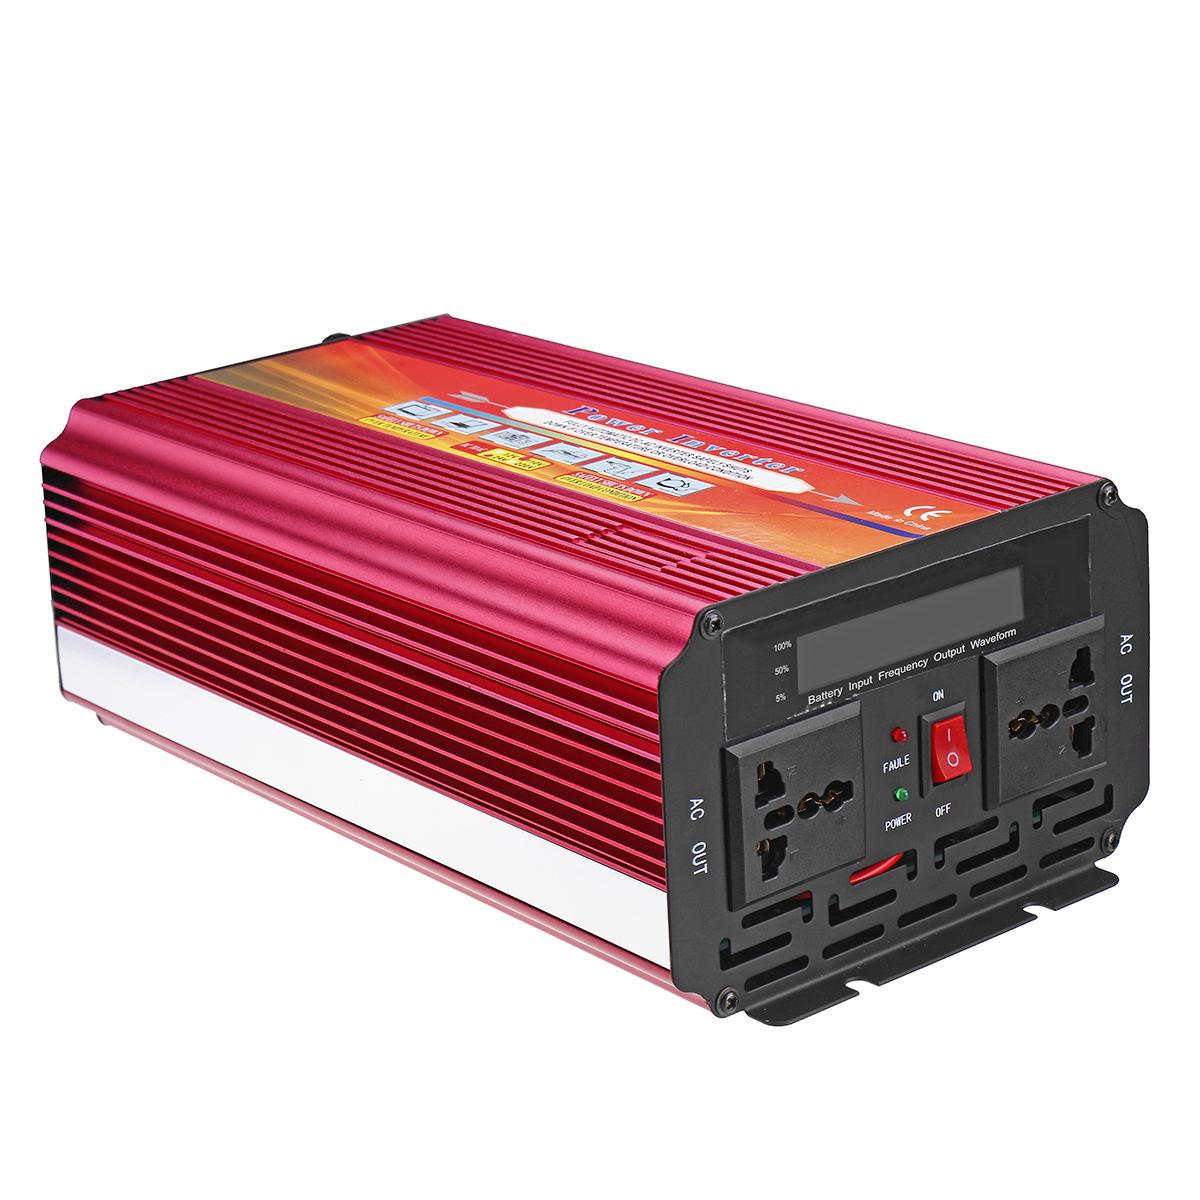 LCD Power Inverter DC 12V/24V to AC 110V/220V 9000W Peak Modified Sine Wave Converter